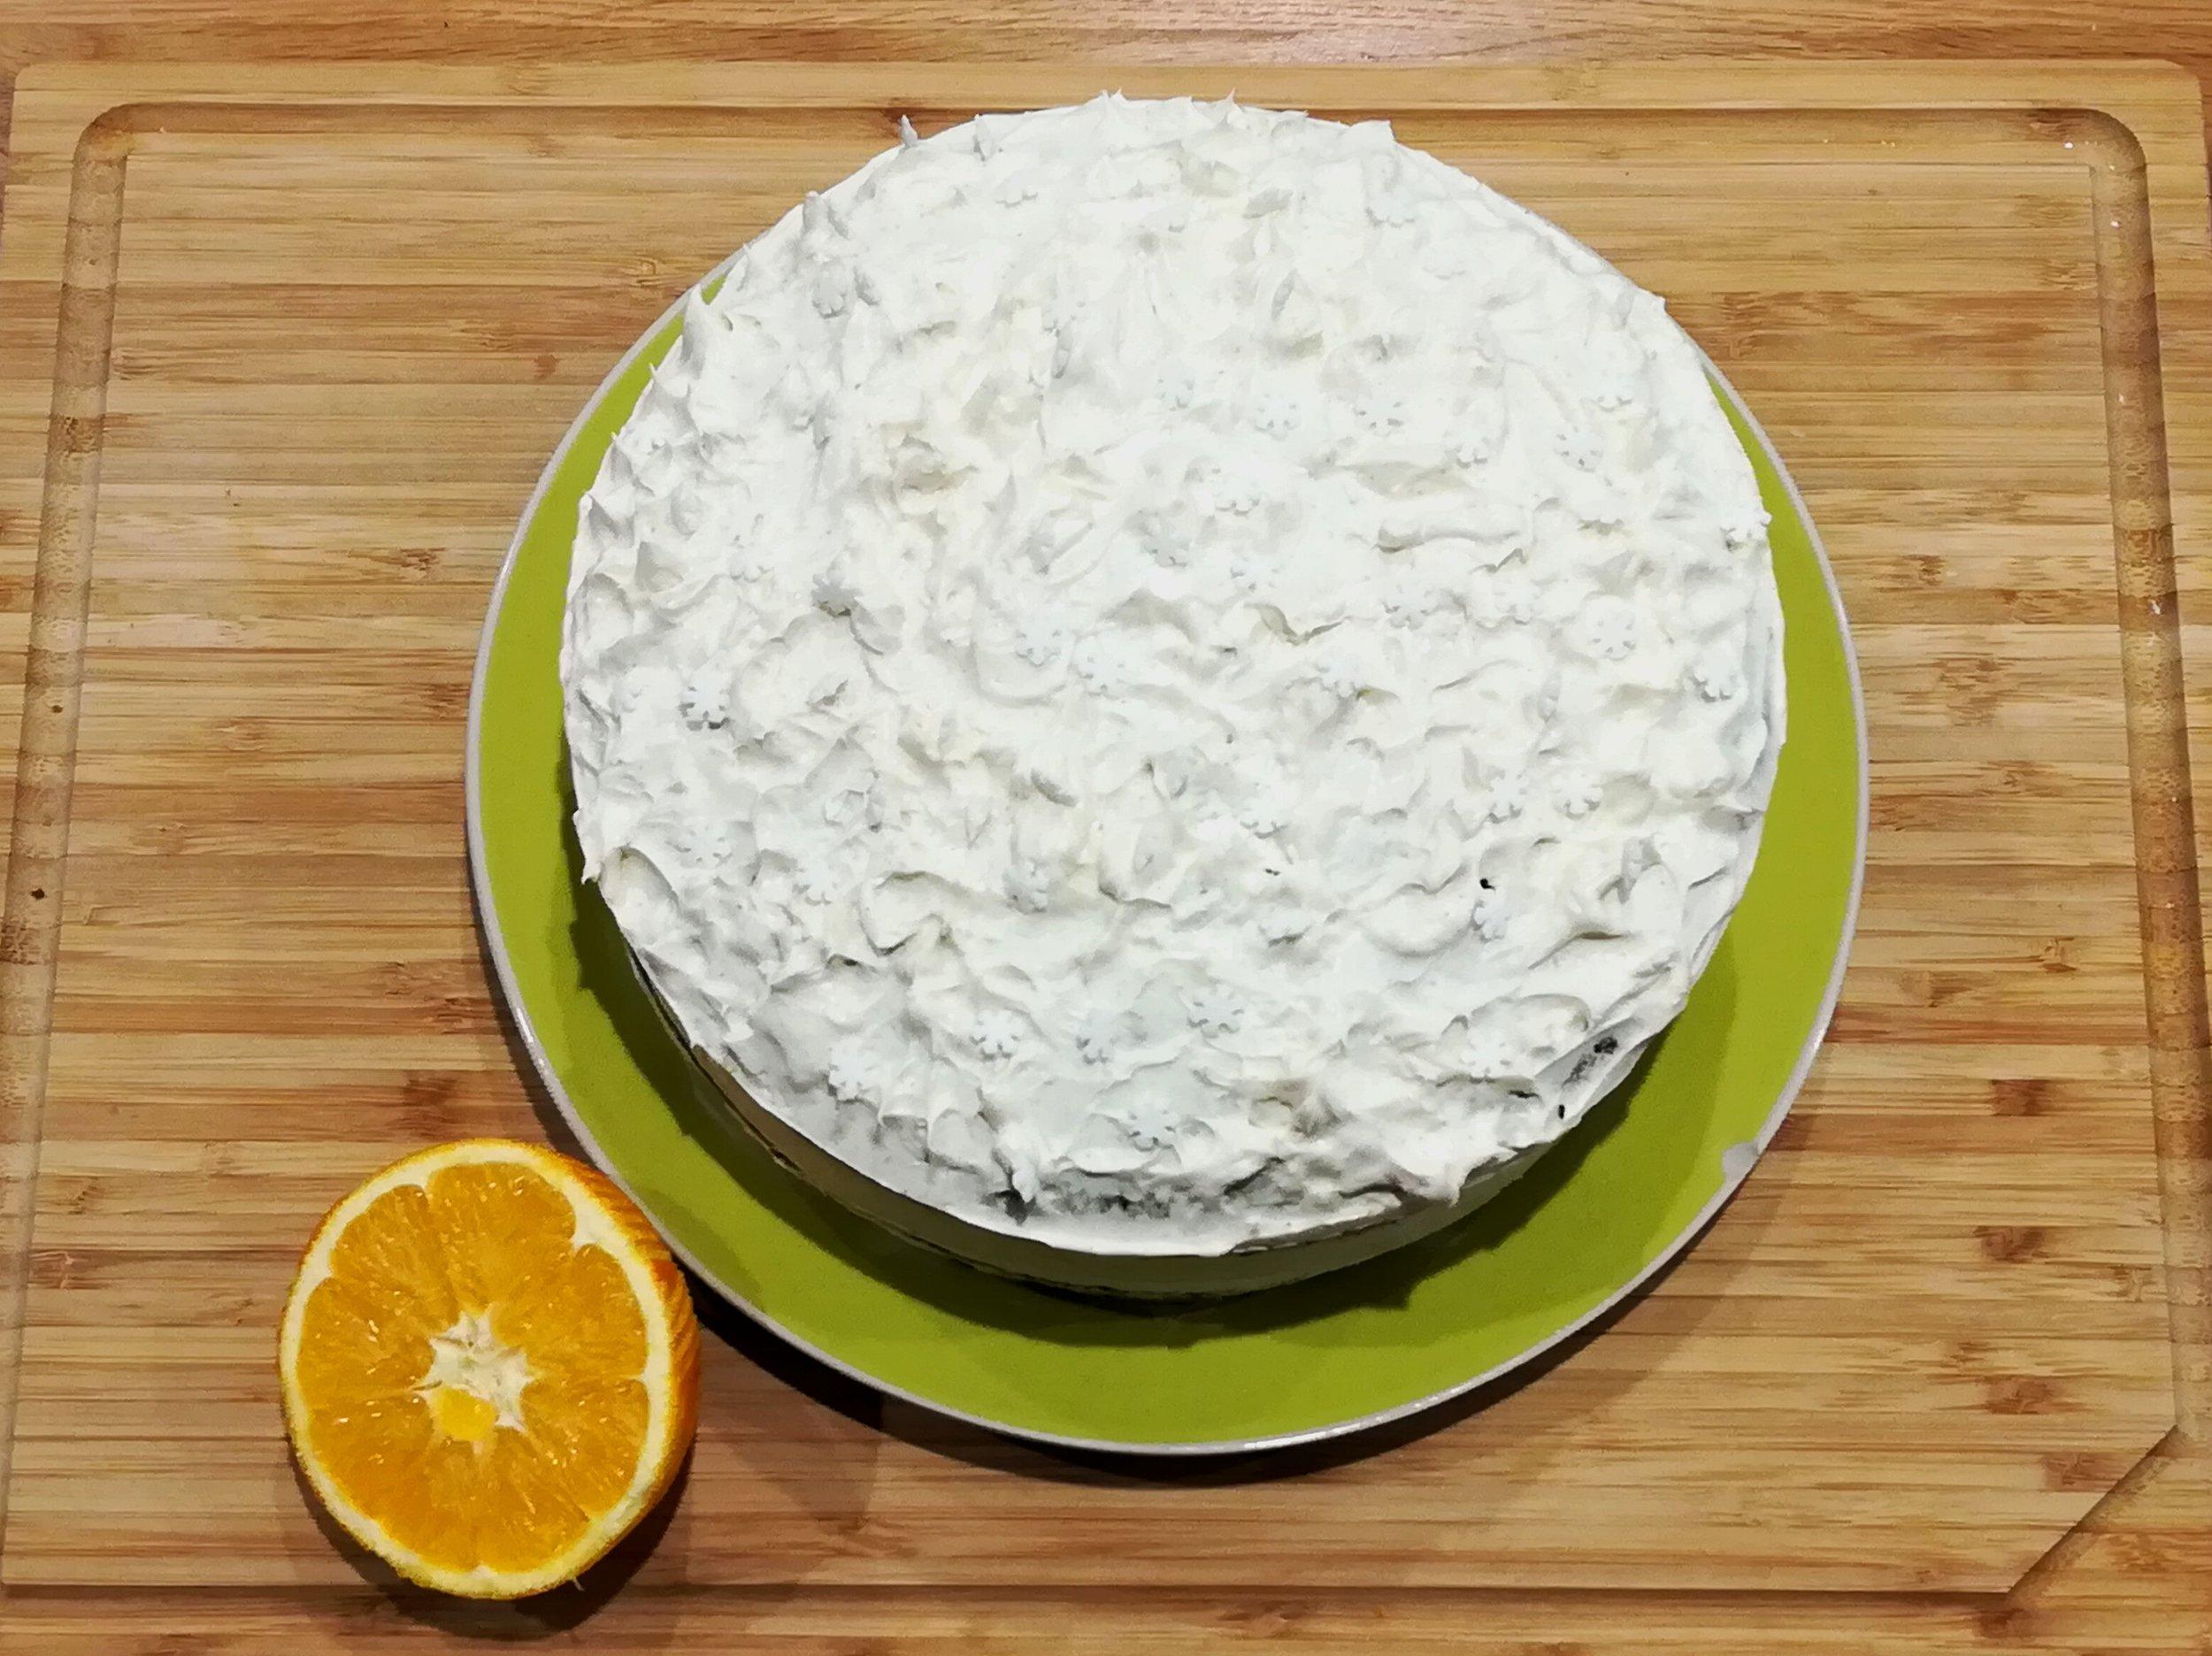 Snowflake decoration definitely essential to top this cake!